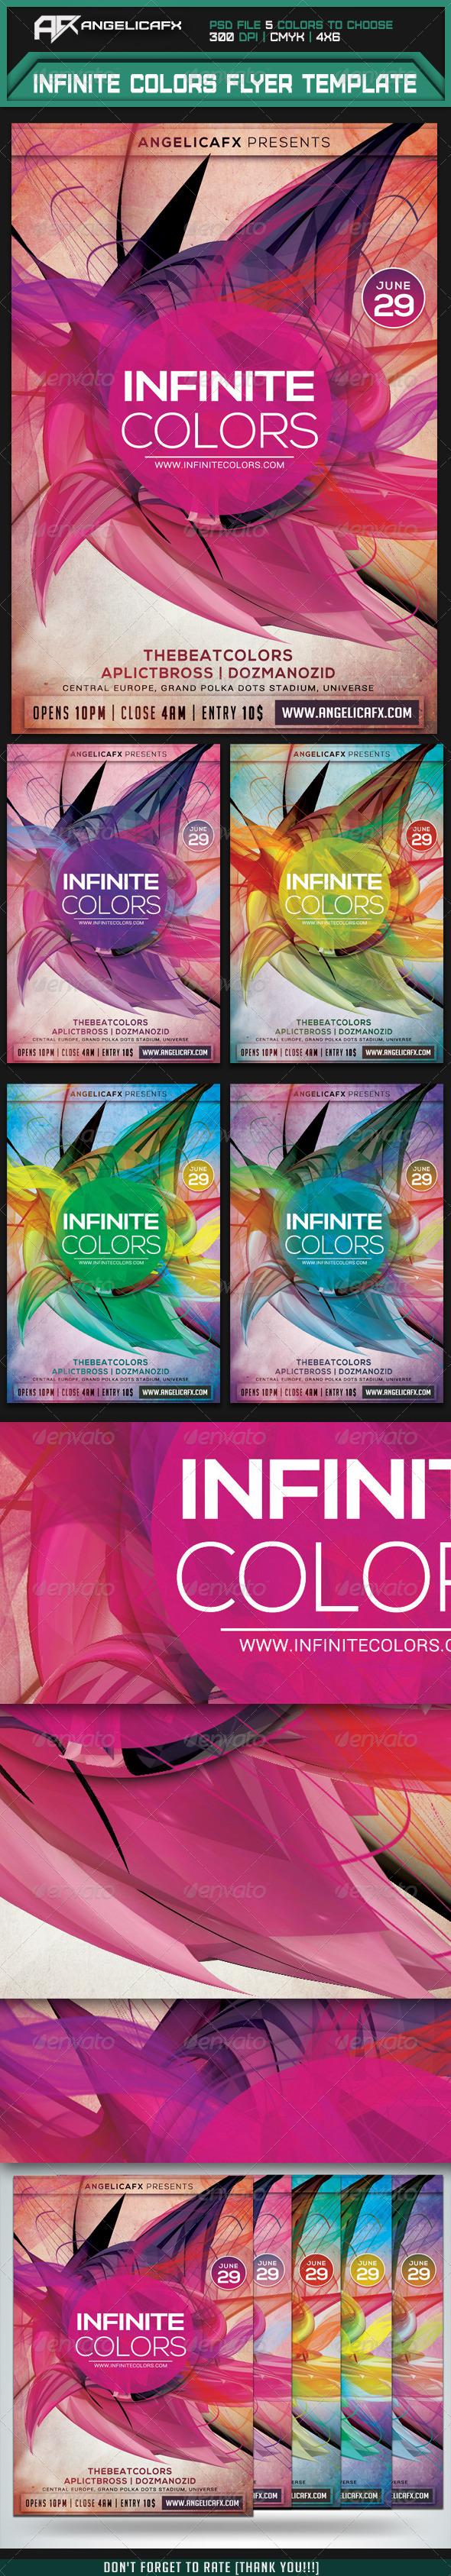 GraphicRiver Infinite Colors Flyer Template 7606152